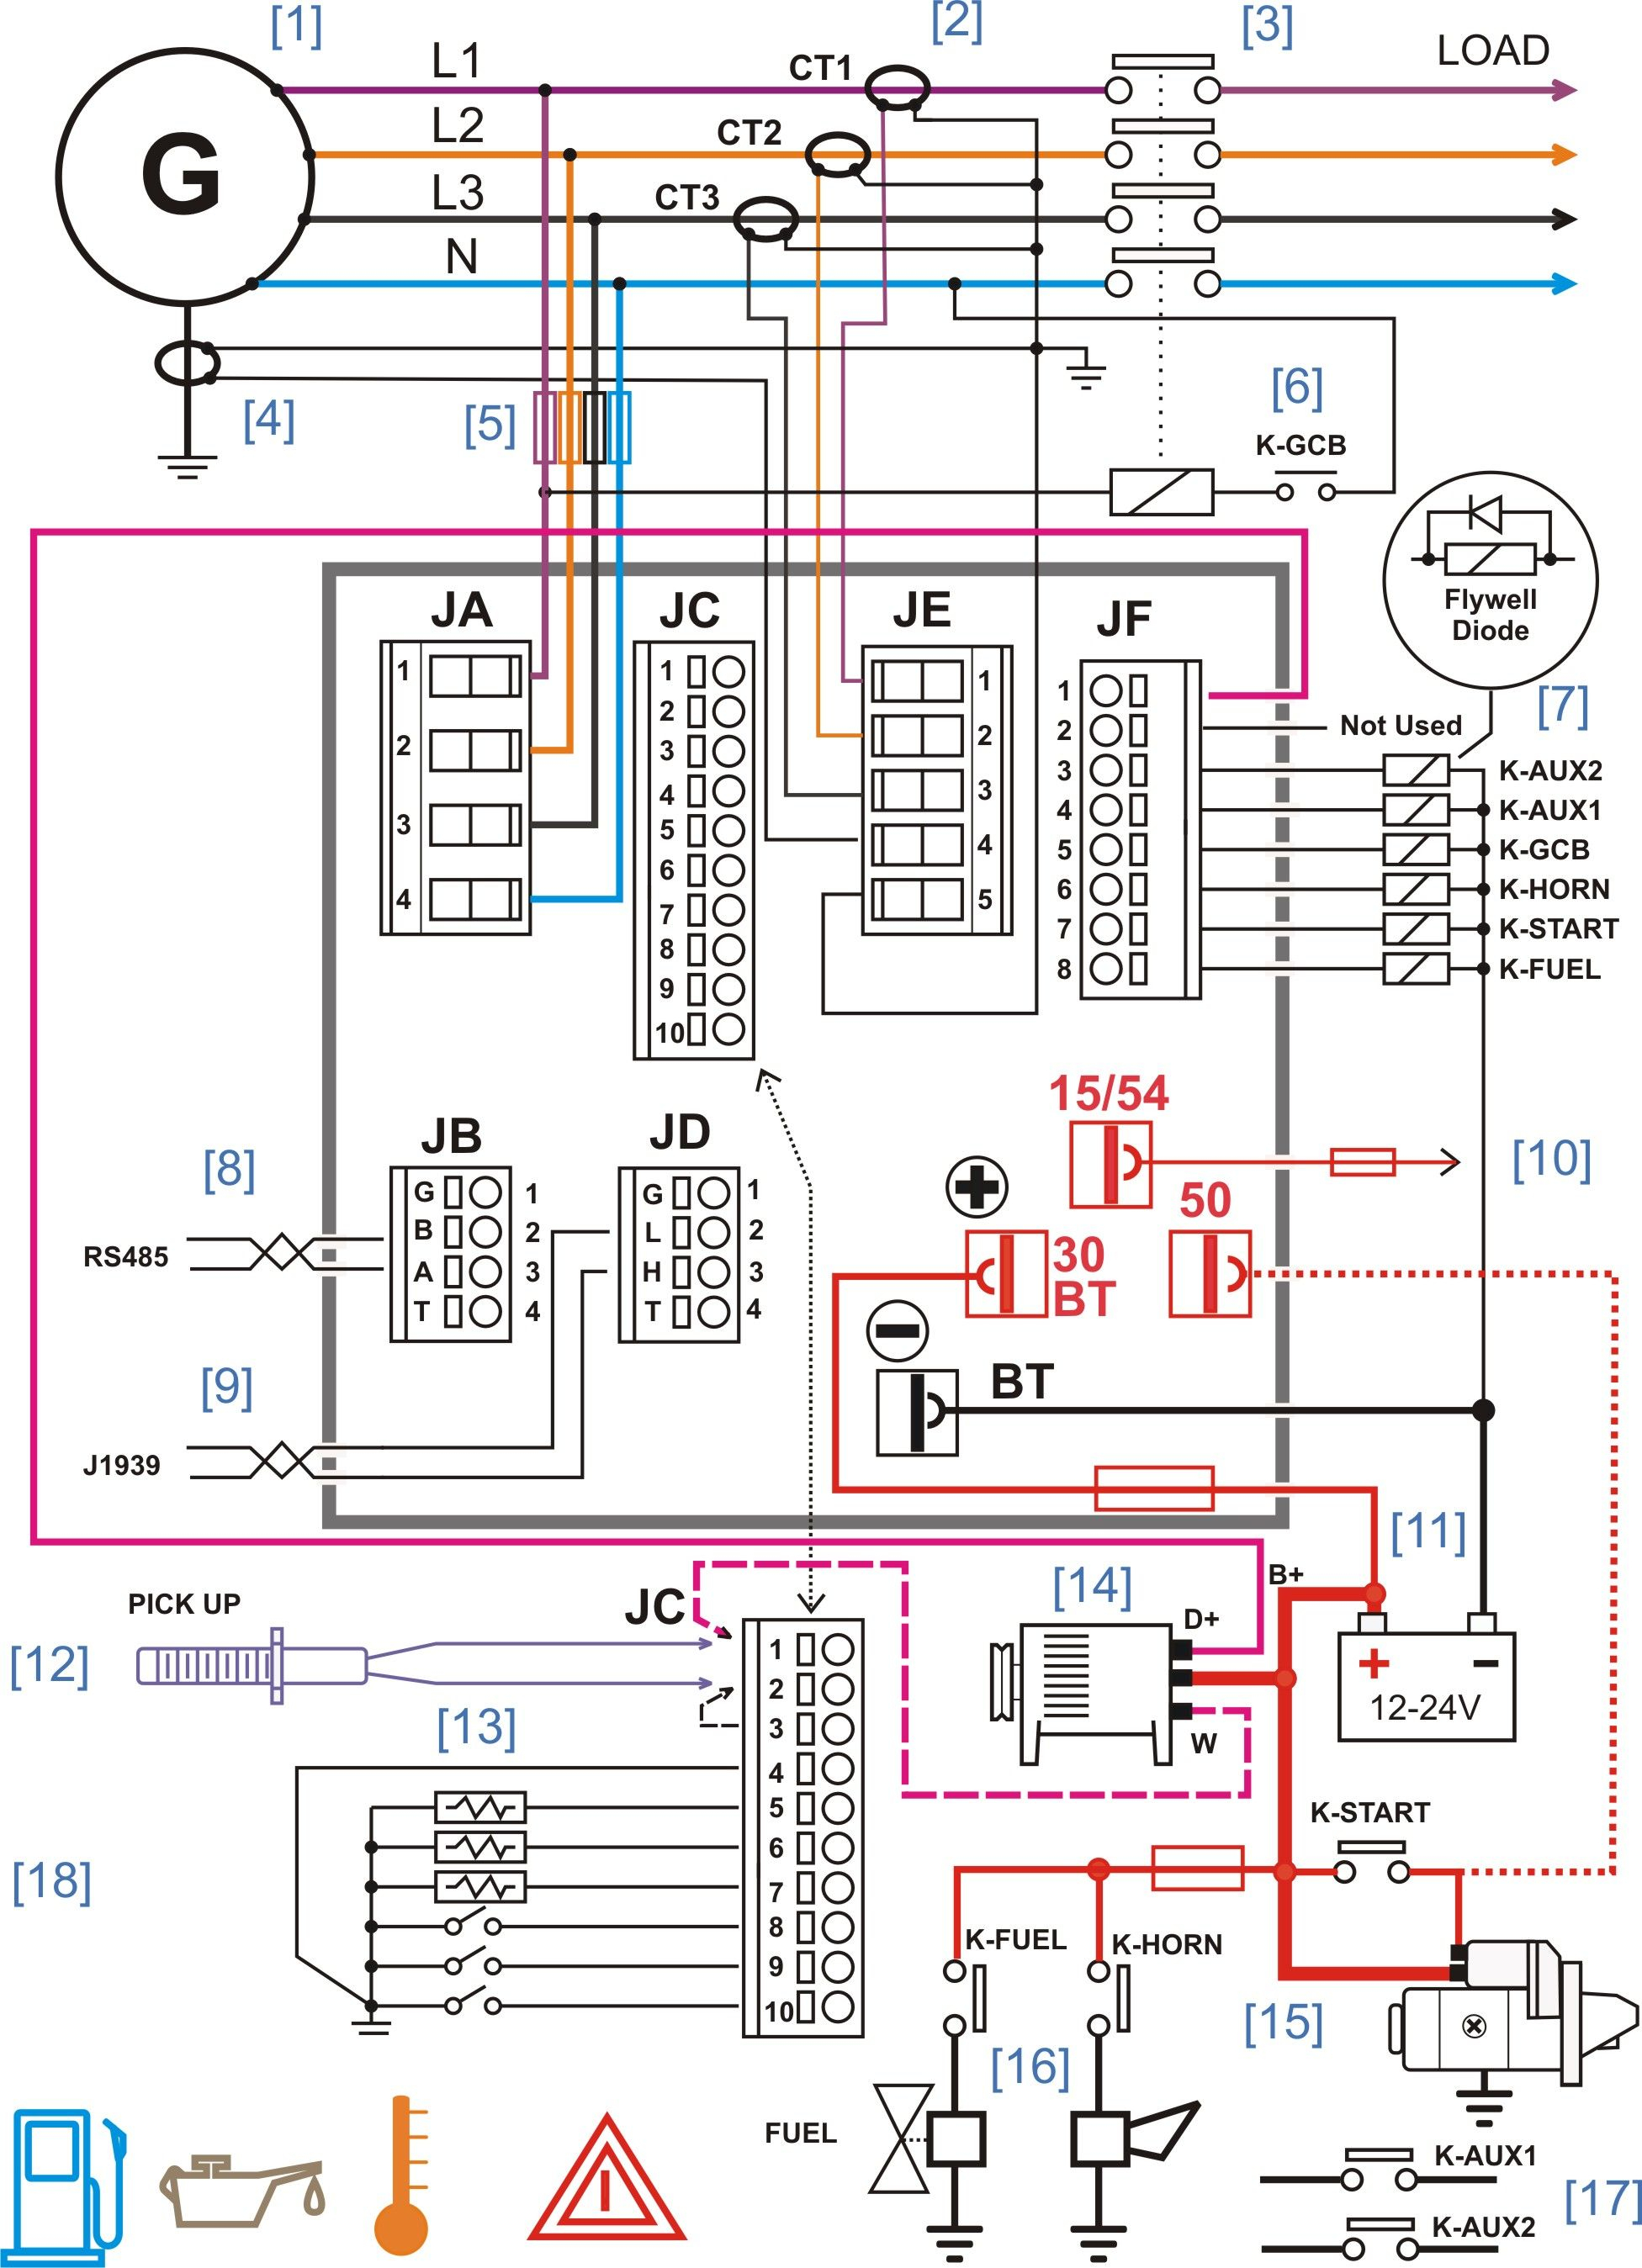 generator transfer switch wiring diagram Collection-Diesel Generator Control Panel Wiring Diagram 15-c